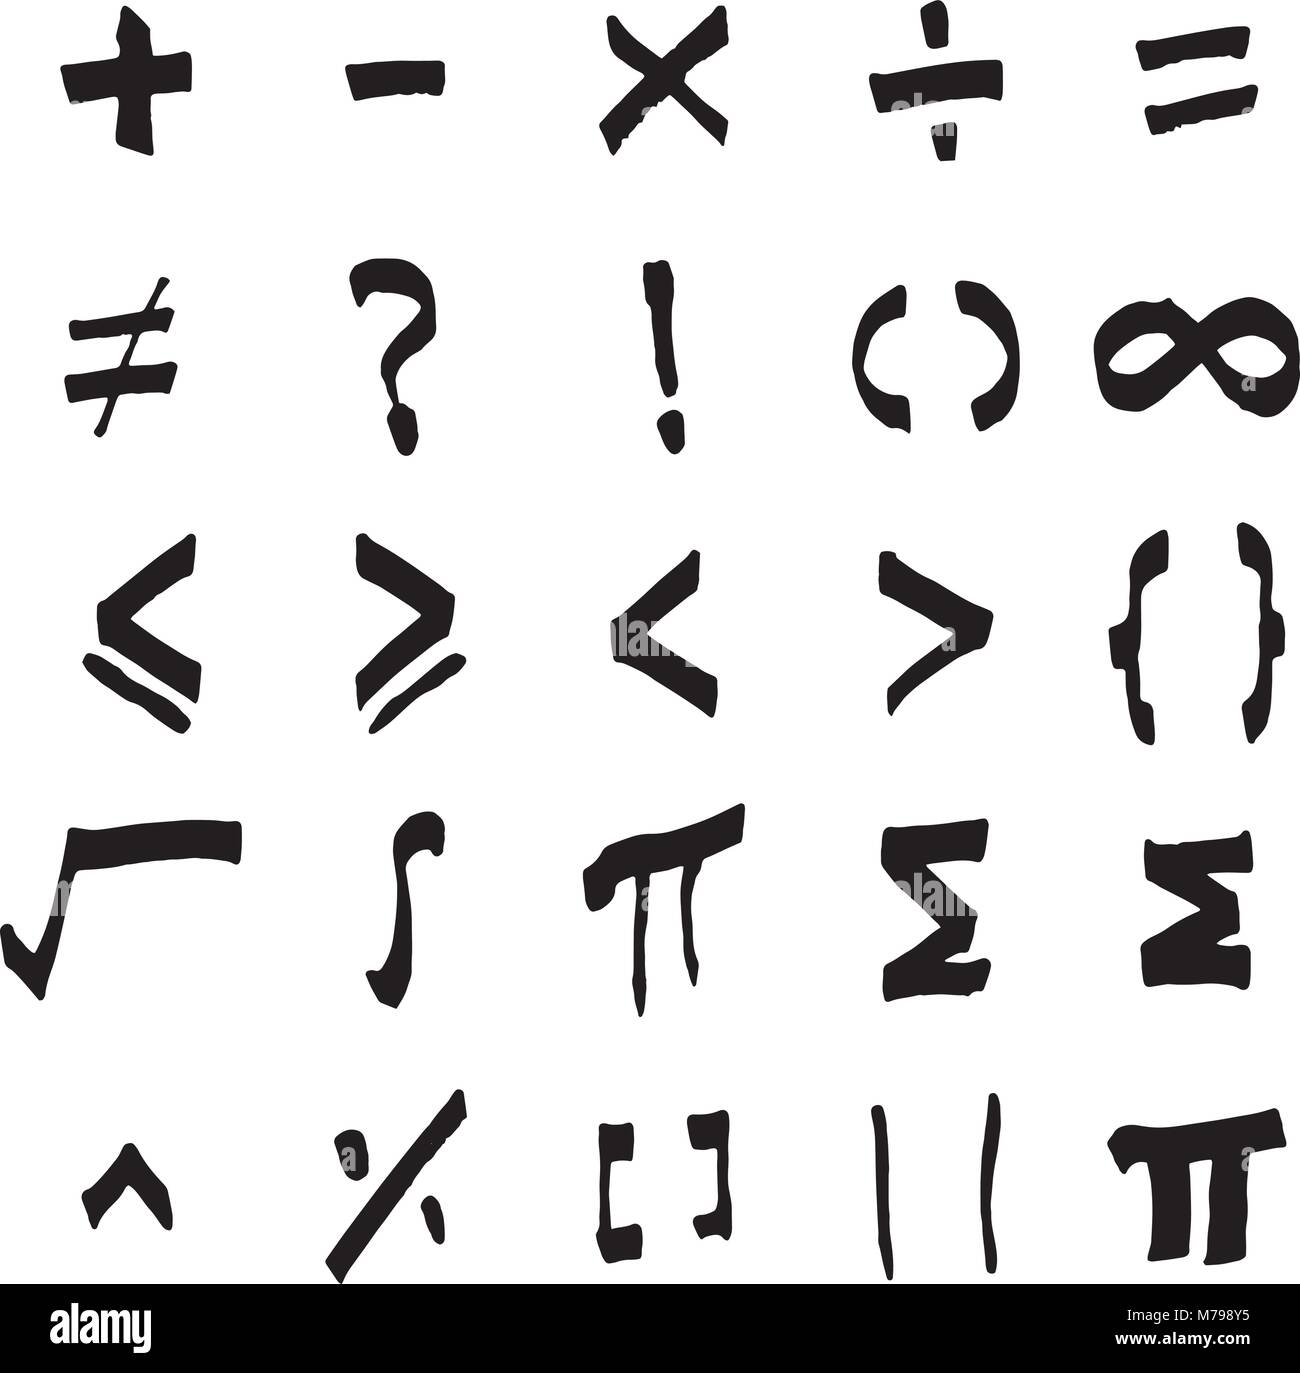 Sigma symbol stock photos sigma symbol stock images alamy black color of handdrawing of basic mathmatics symbol on white background stock image biocorpaavc Images